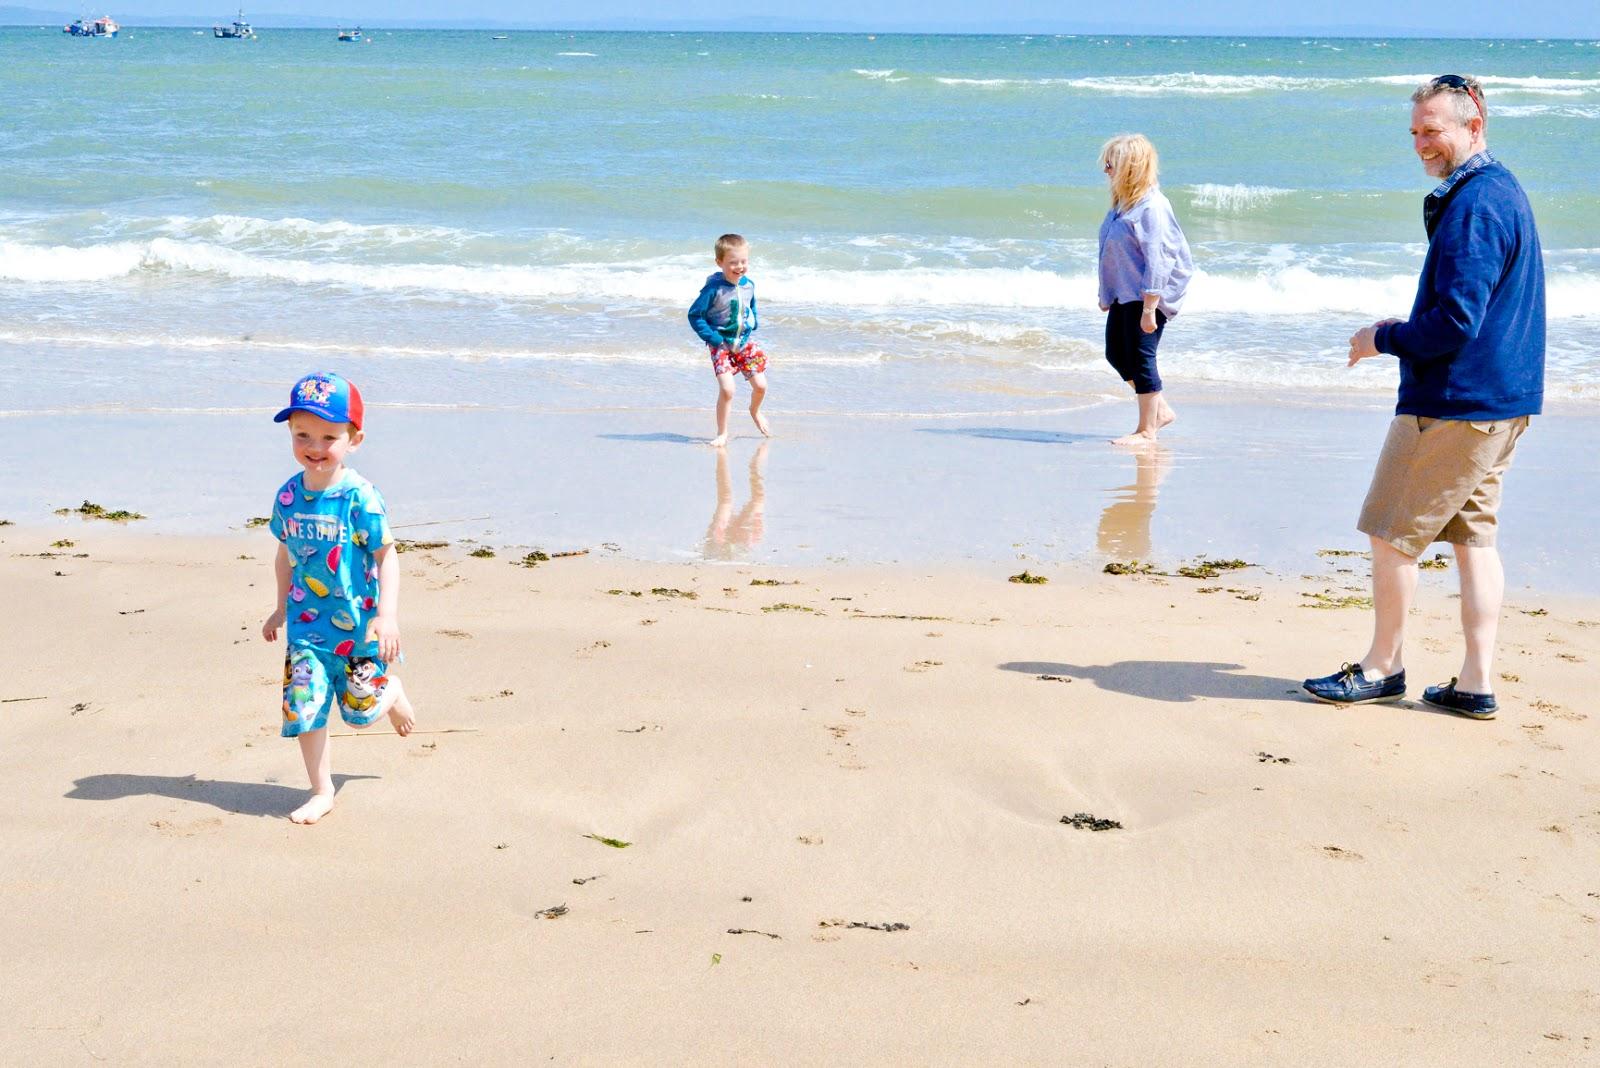 tenby beach pembrokeshire wales